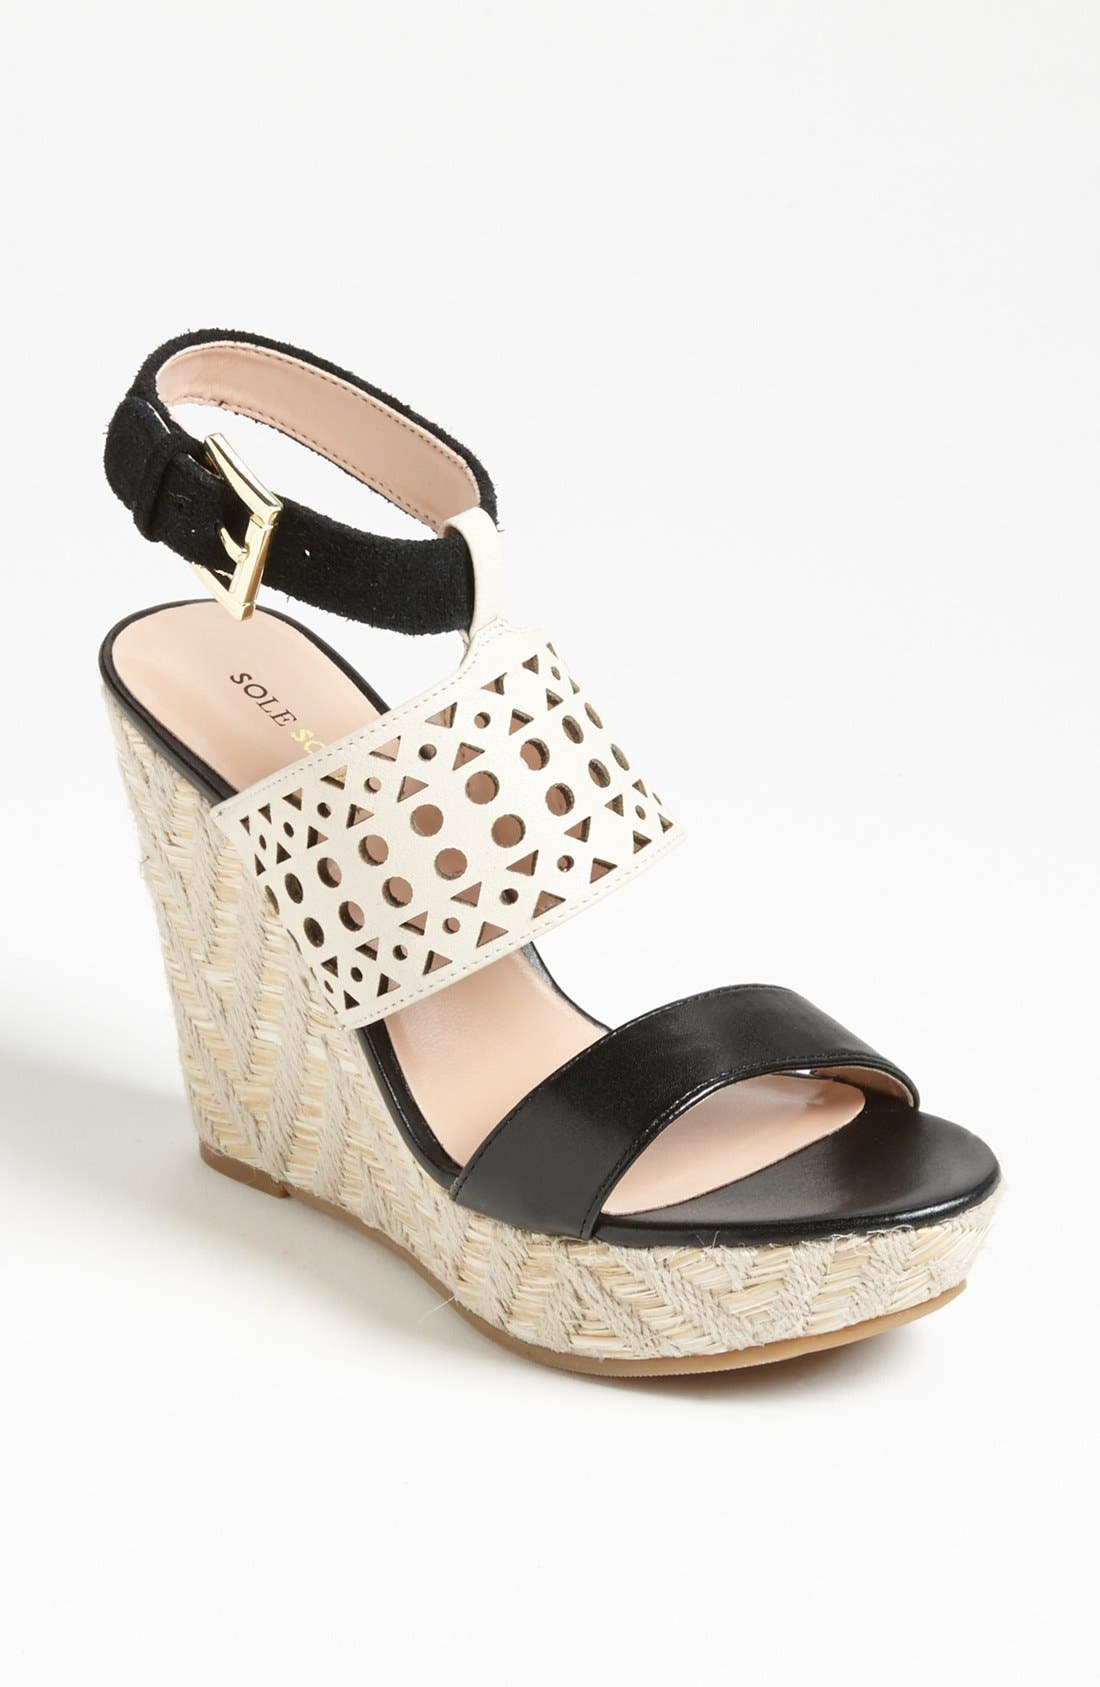 Main Image - Sole Society 'Bristol' Wedge Sandal